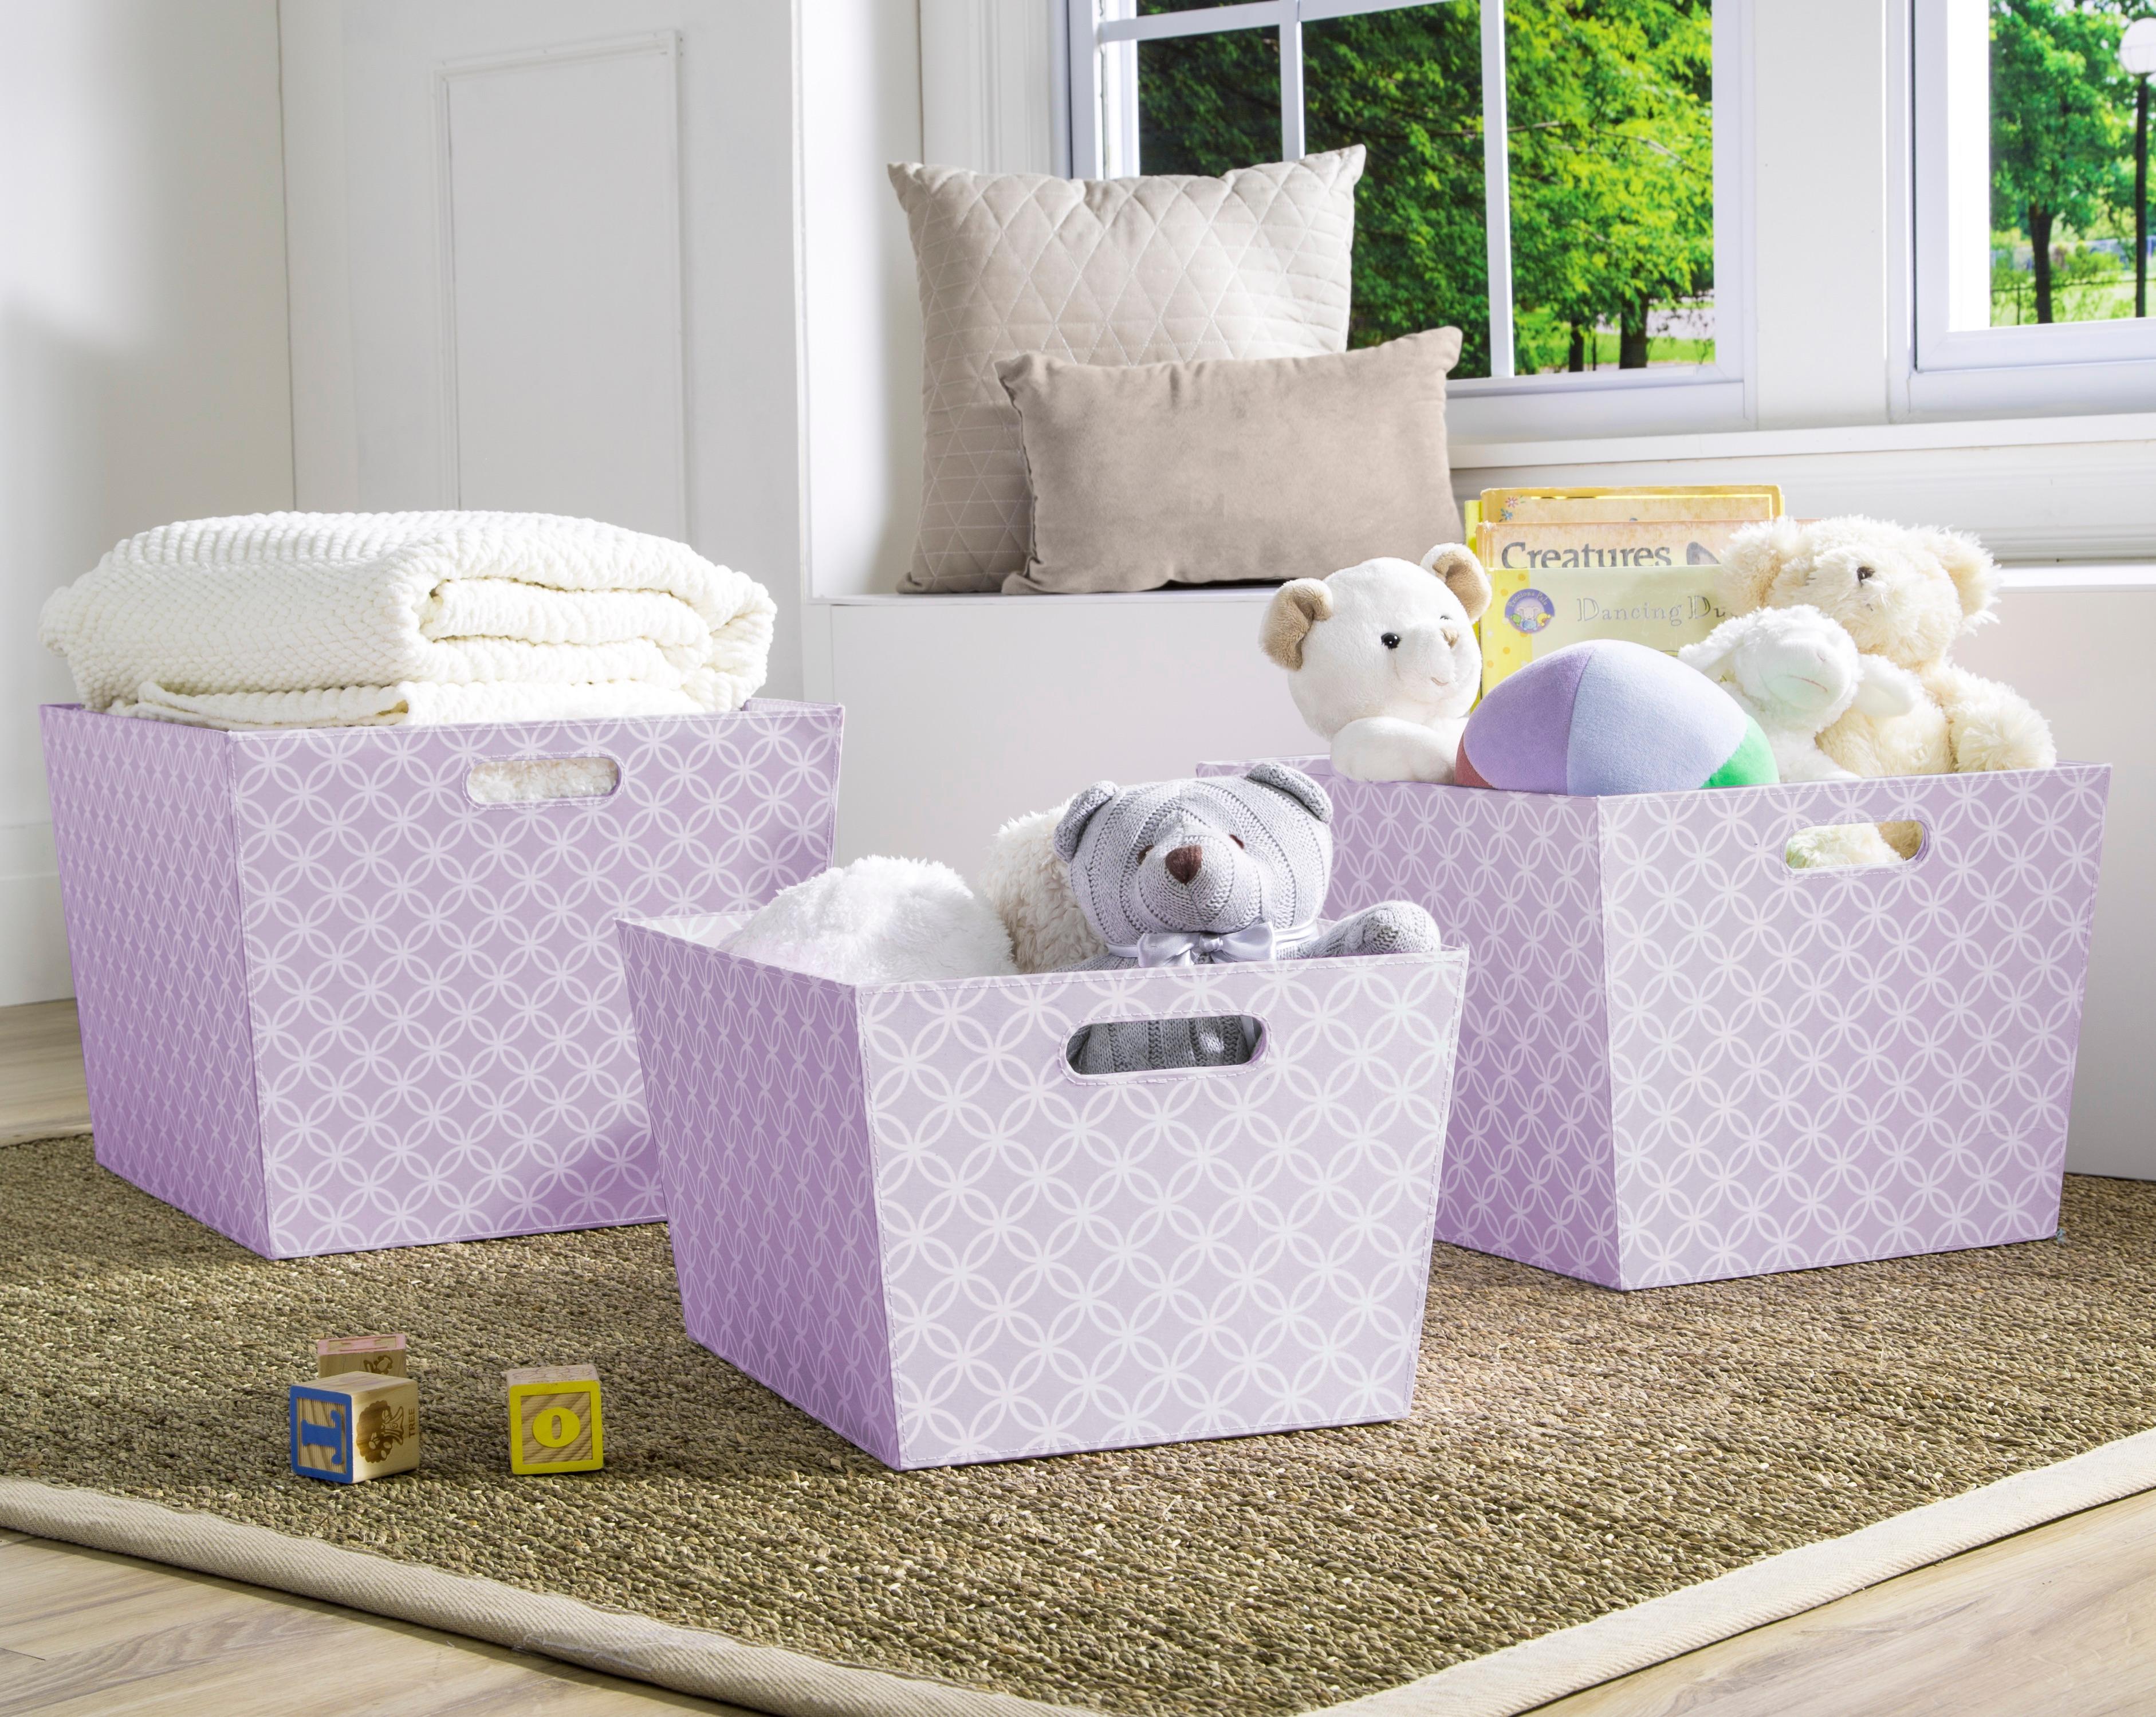 Lavender Nursery Amazoncom Delta Children Deluxe Totes Lavender Geometric 3